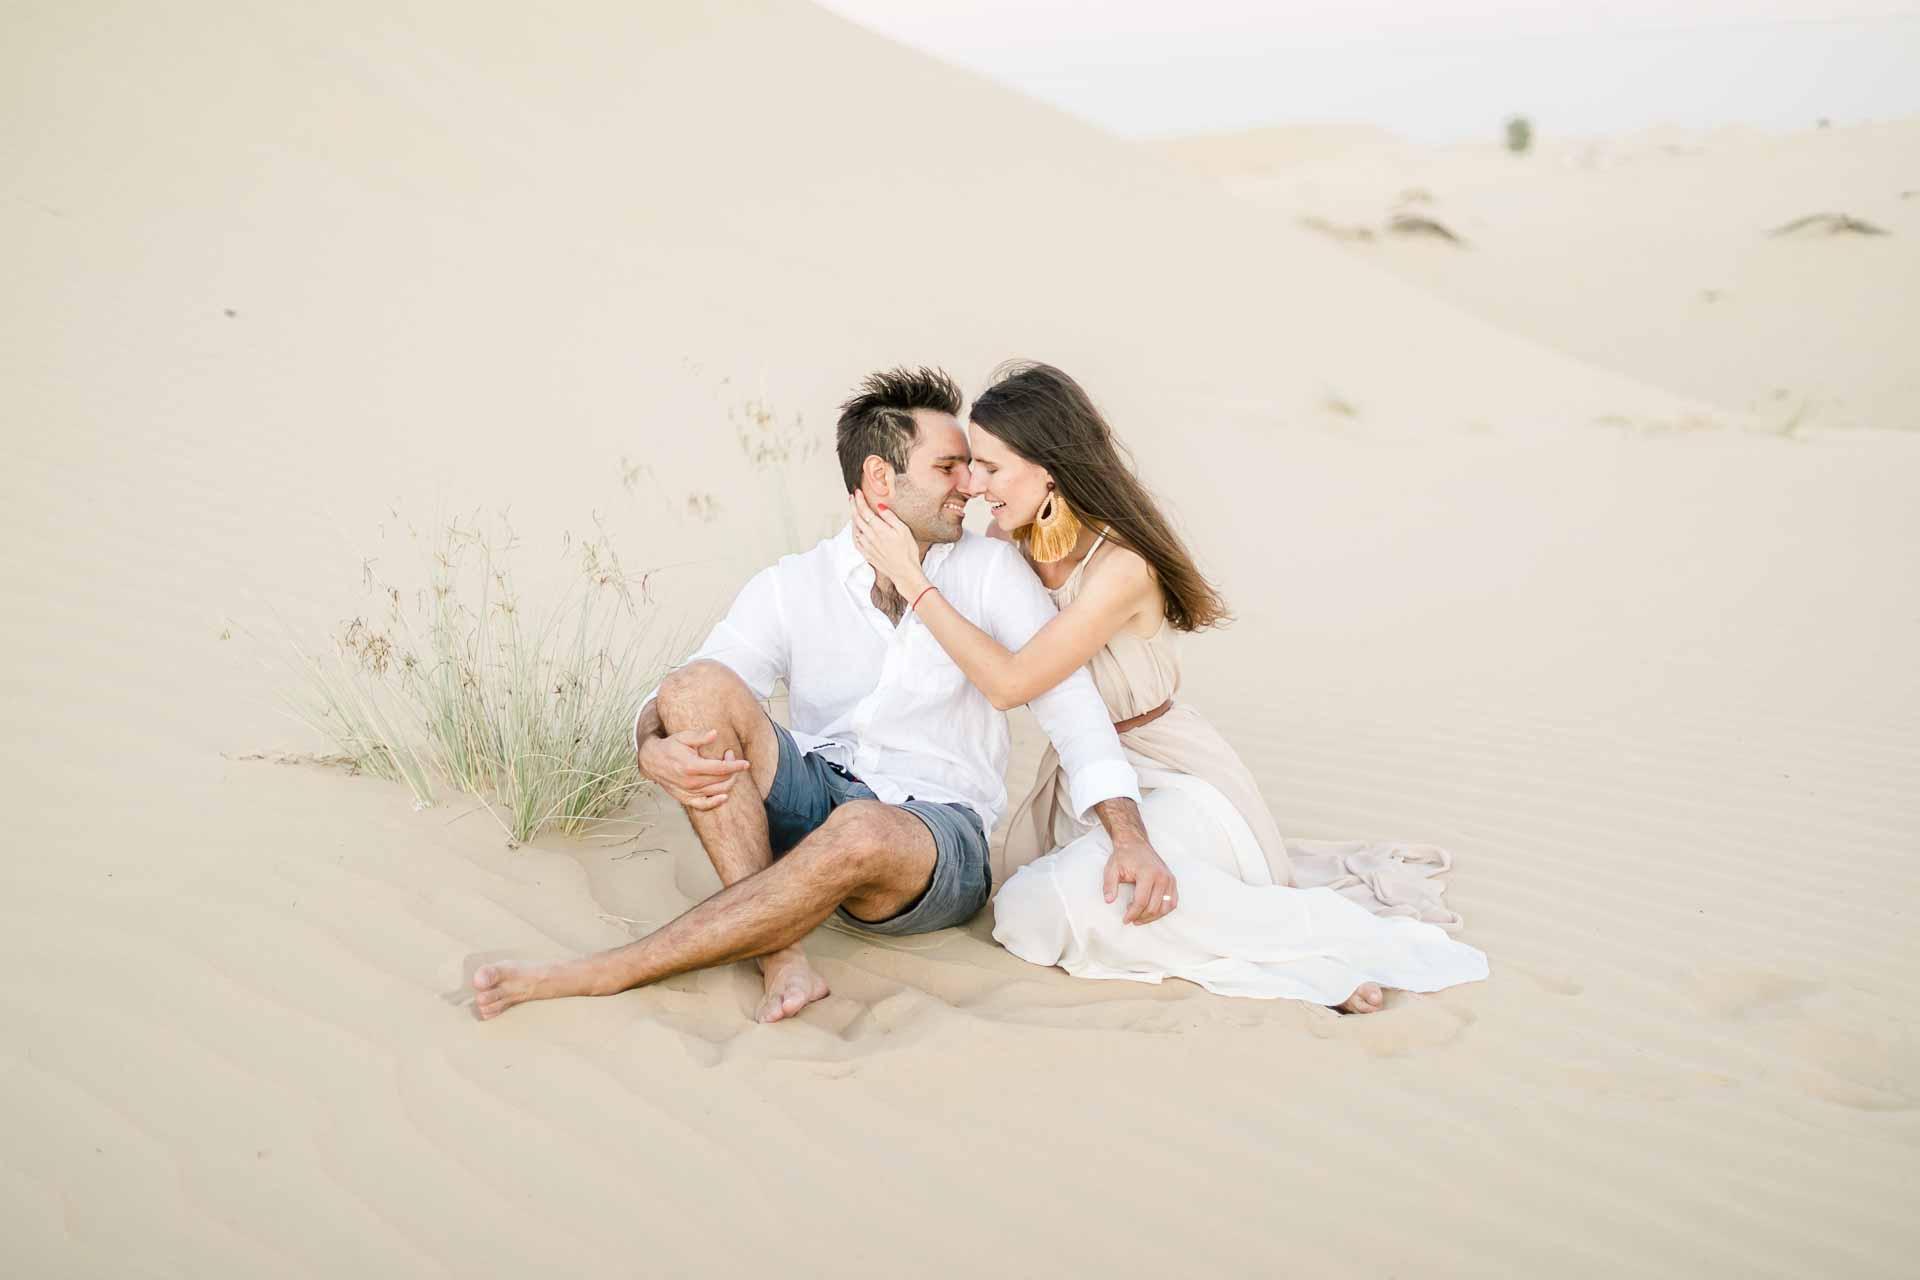 Heiraten Mödling Hochzeitsfotograf Wien Paarshooting Dubai